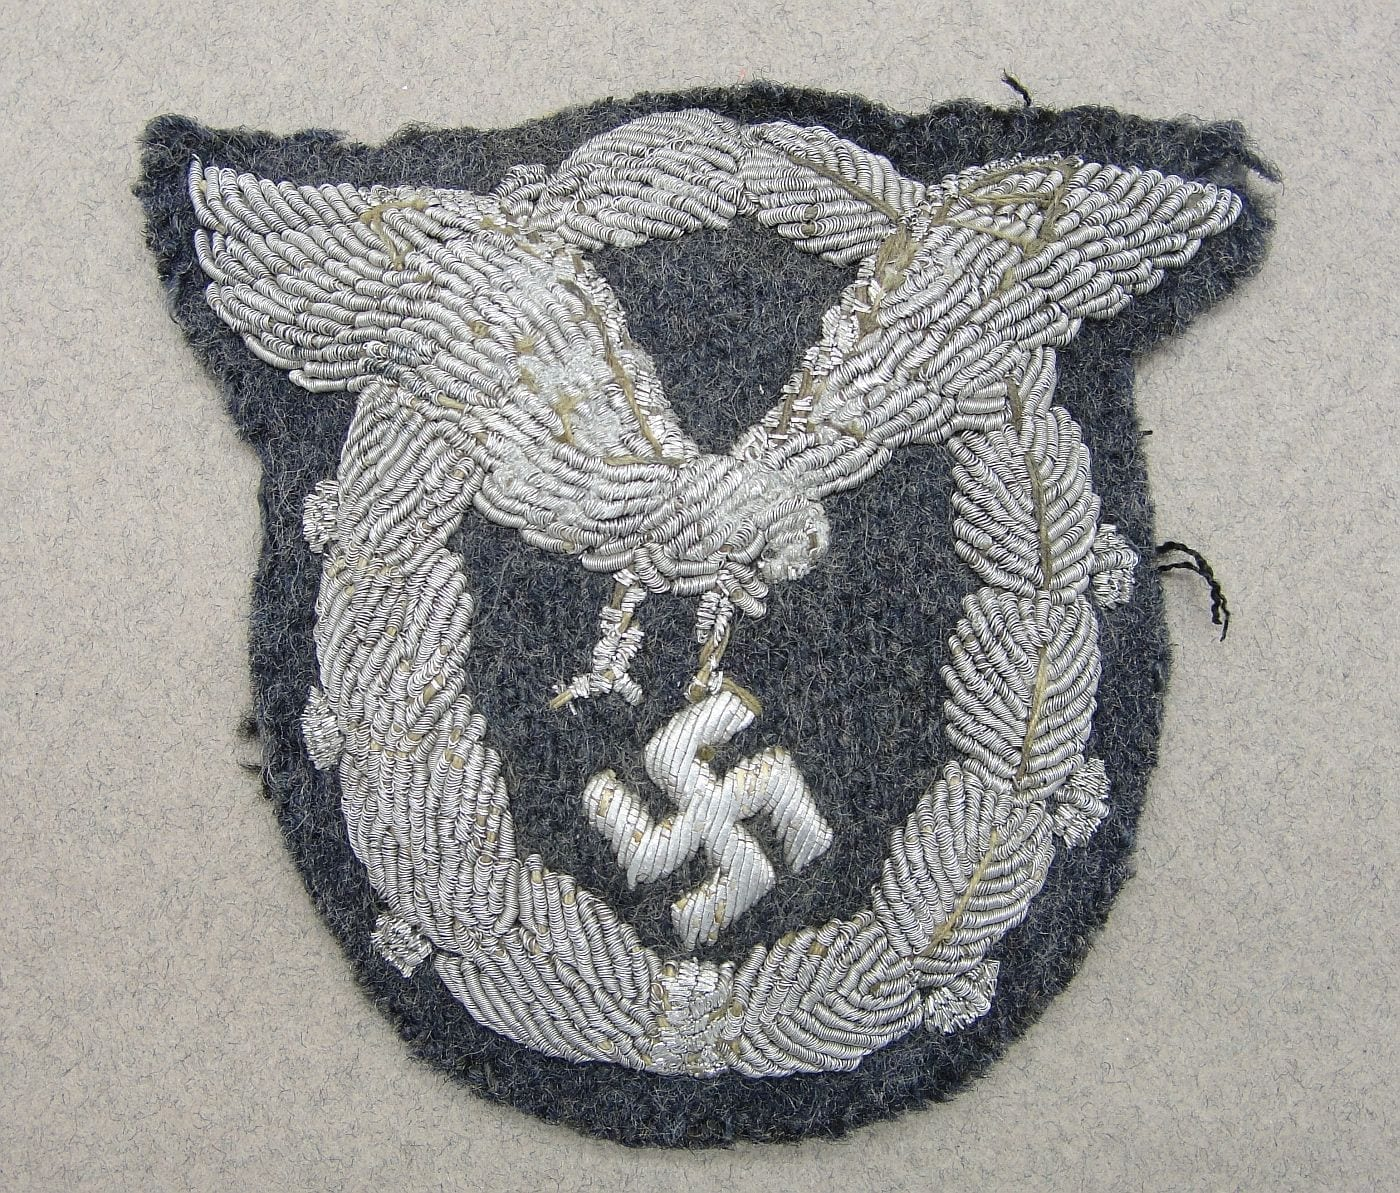 Luftwaffe Pilot's Badge in Bullion